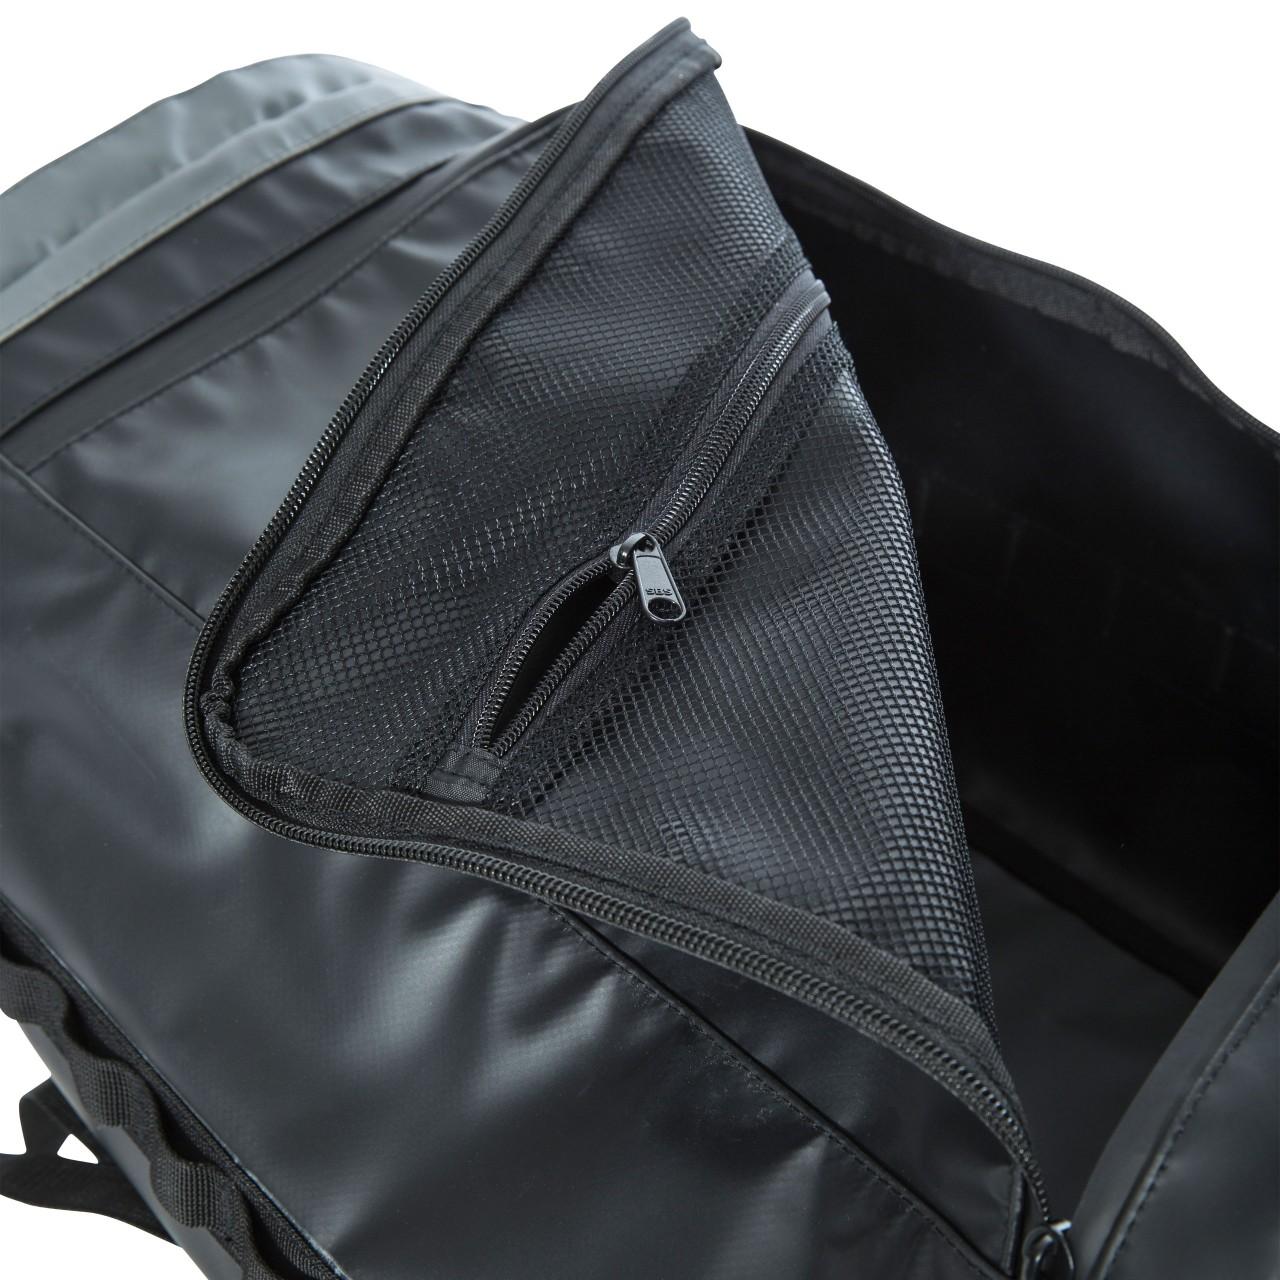 08136dd9a3 Trespass - Sac de sport BLACKFRIAR (40 Litres) (TP4265) | eBay